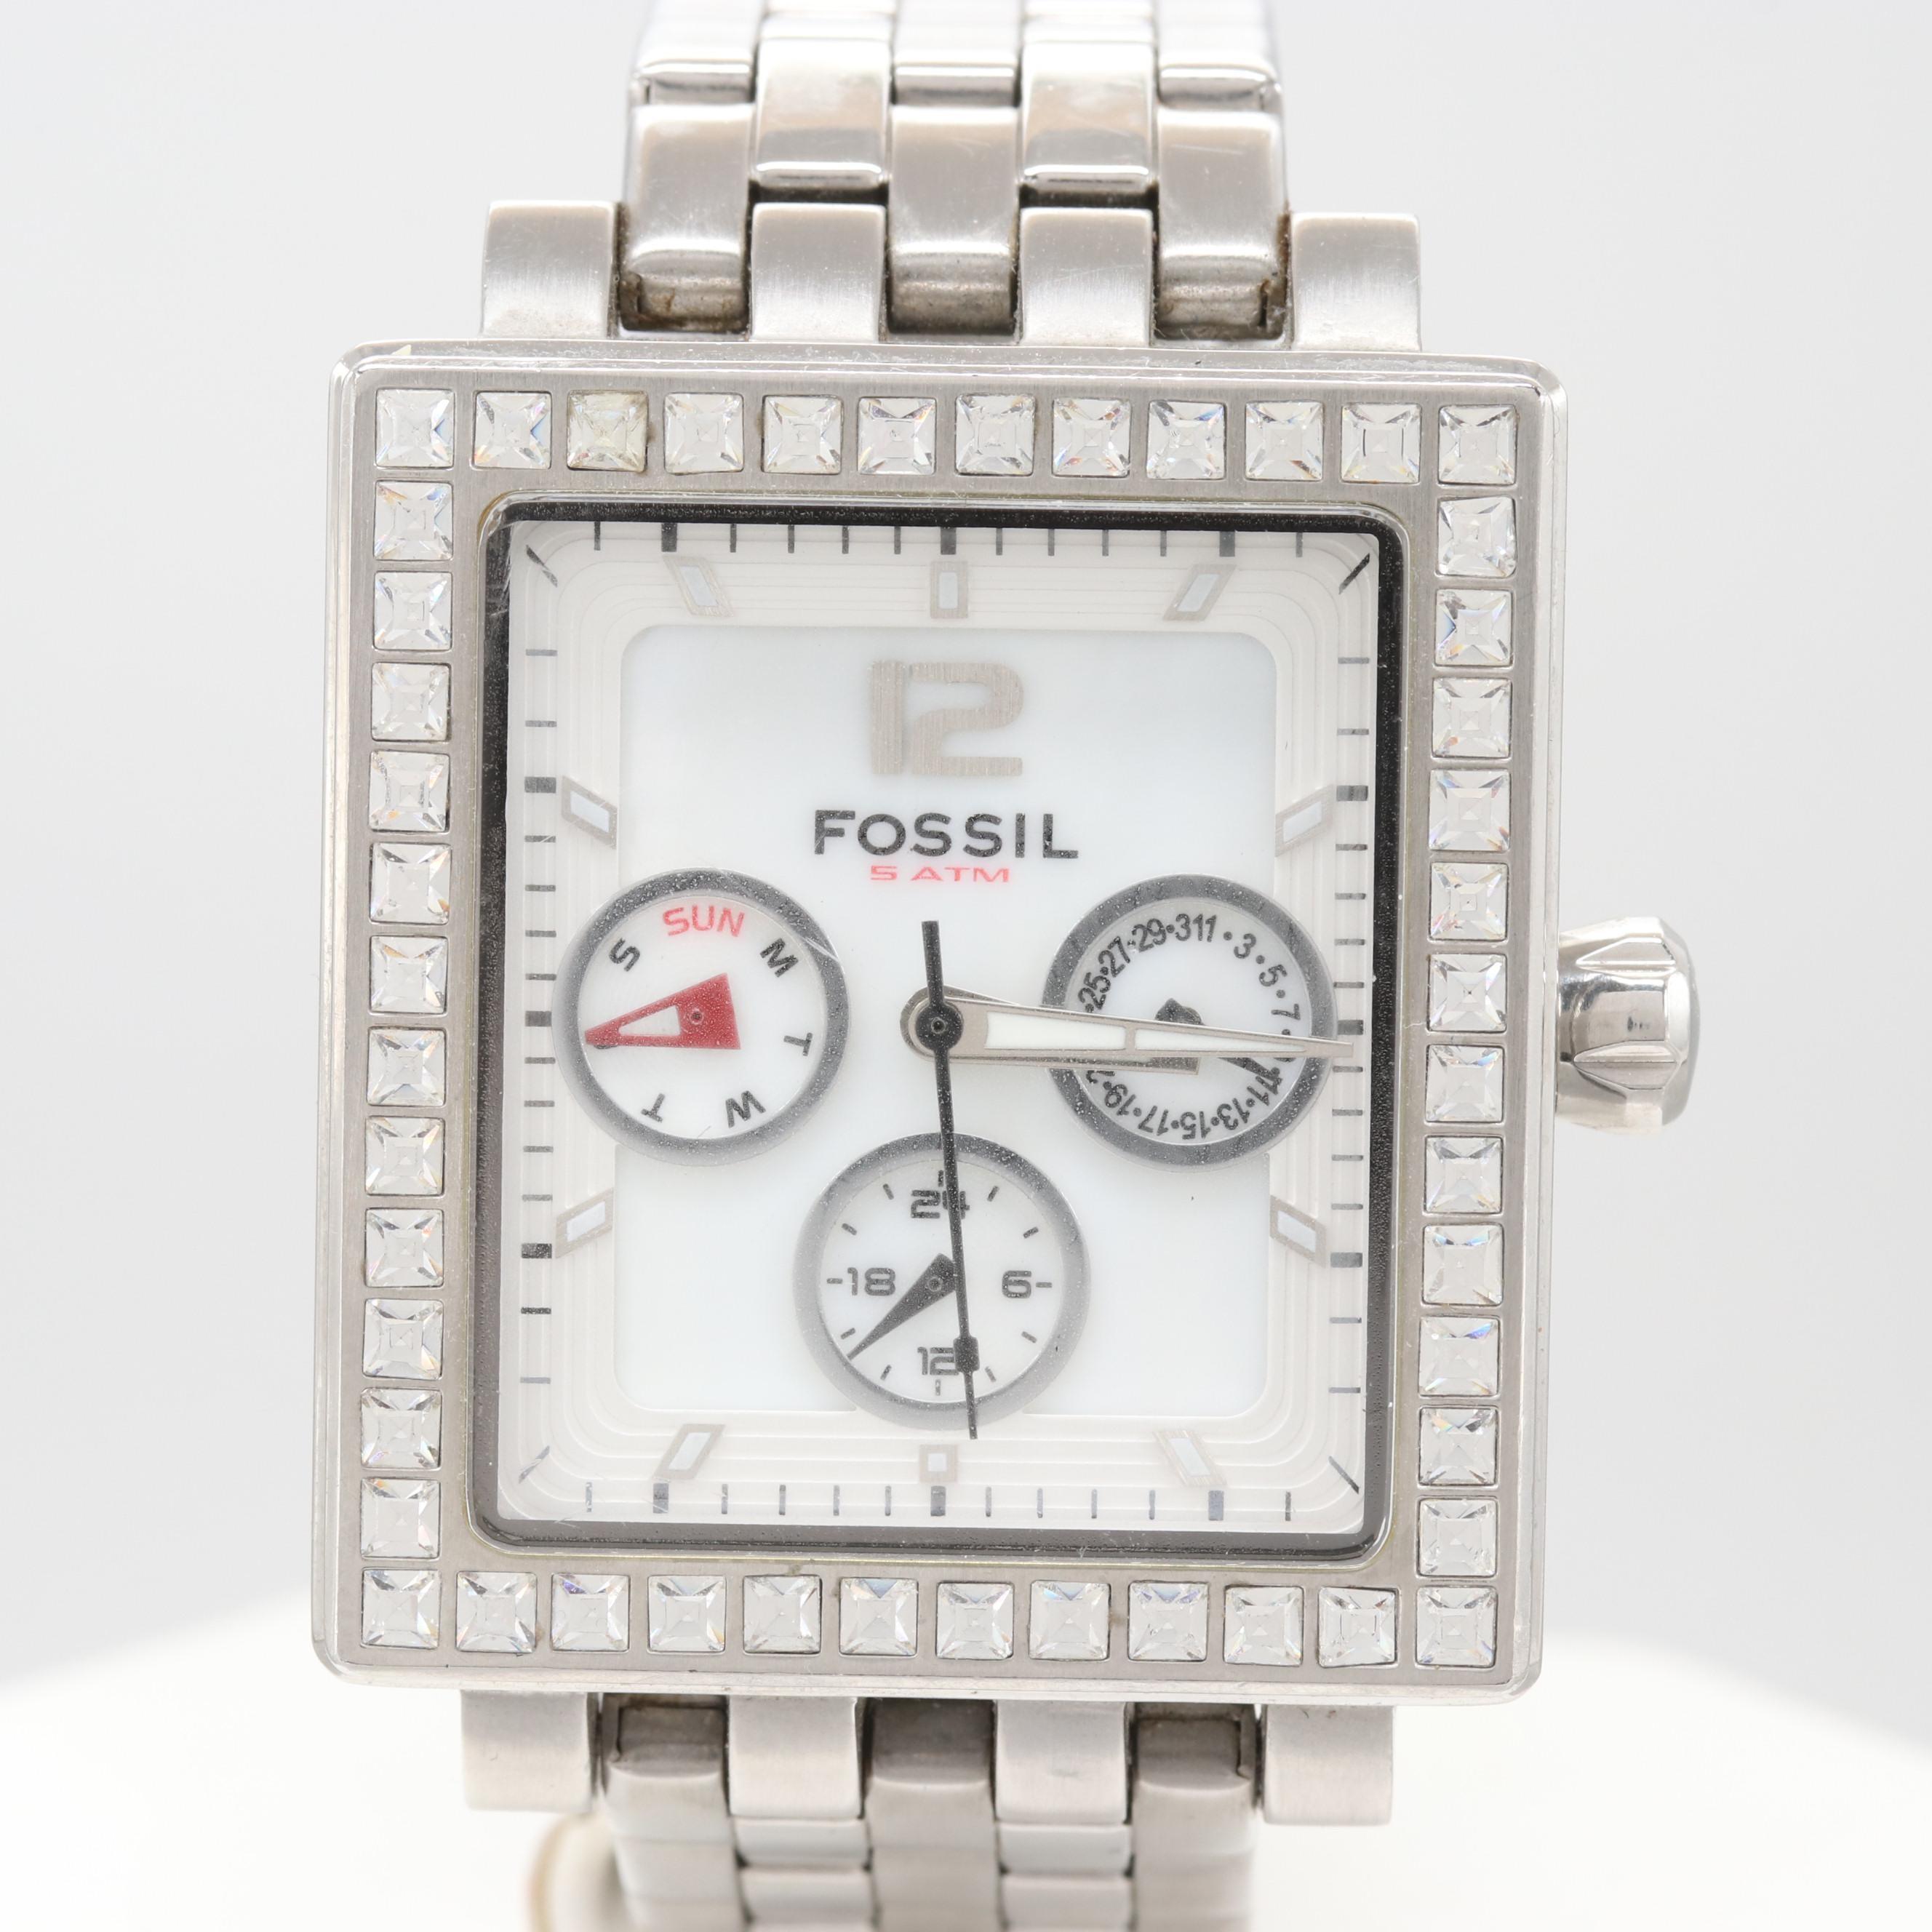 Fossil Stainless Steel Glass Crystal Model# BQ-9366 Wristwatch